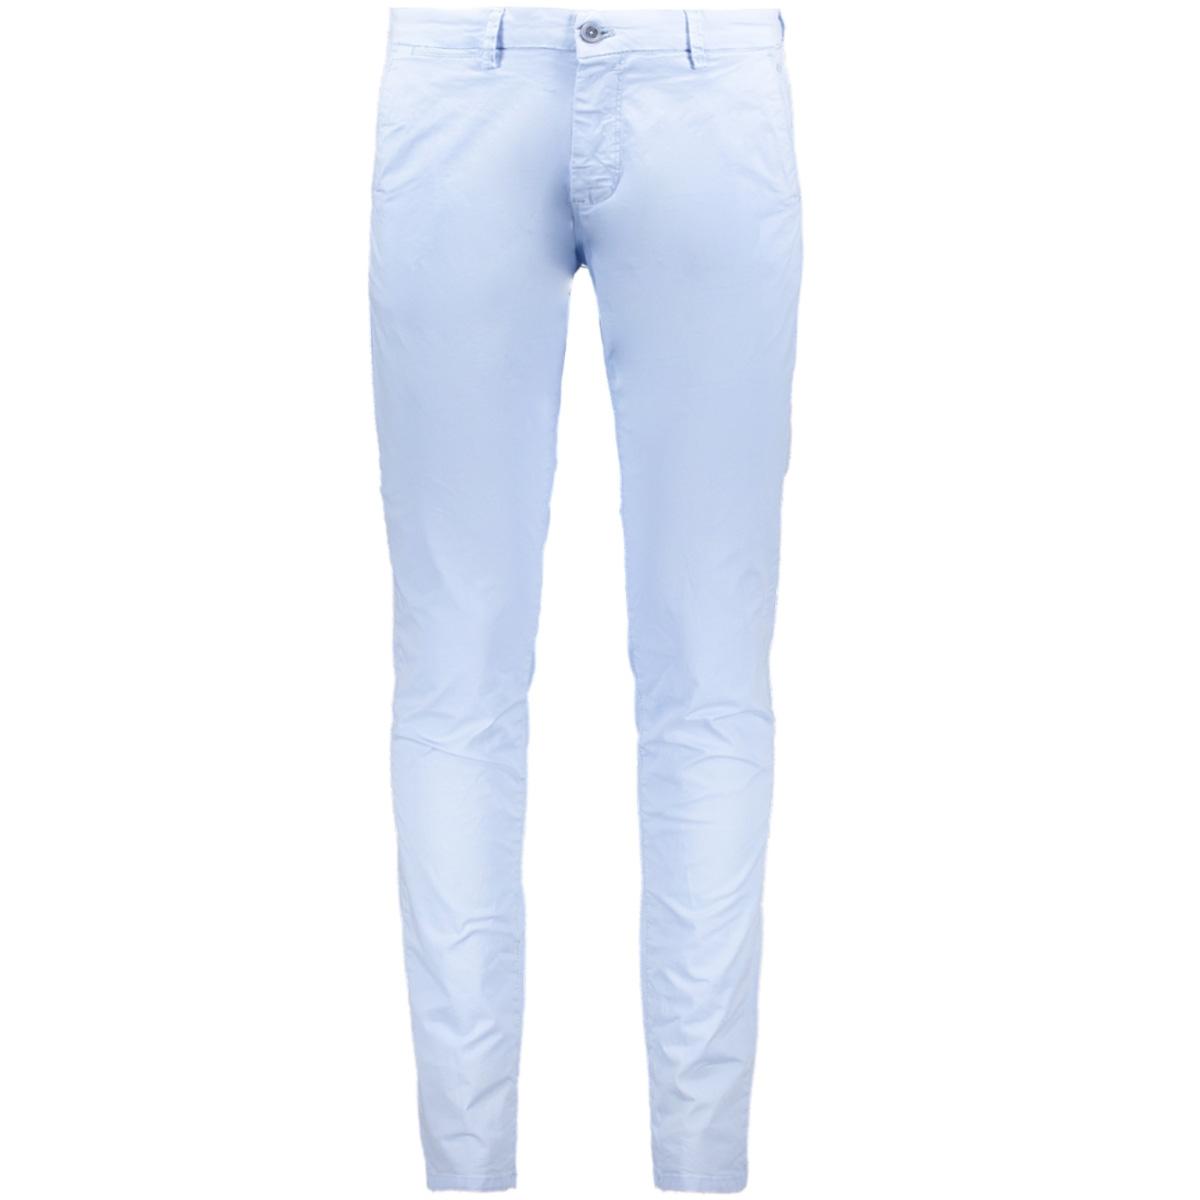 82584 gabbiano broek blue